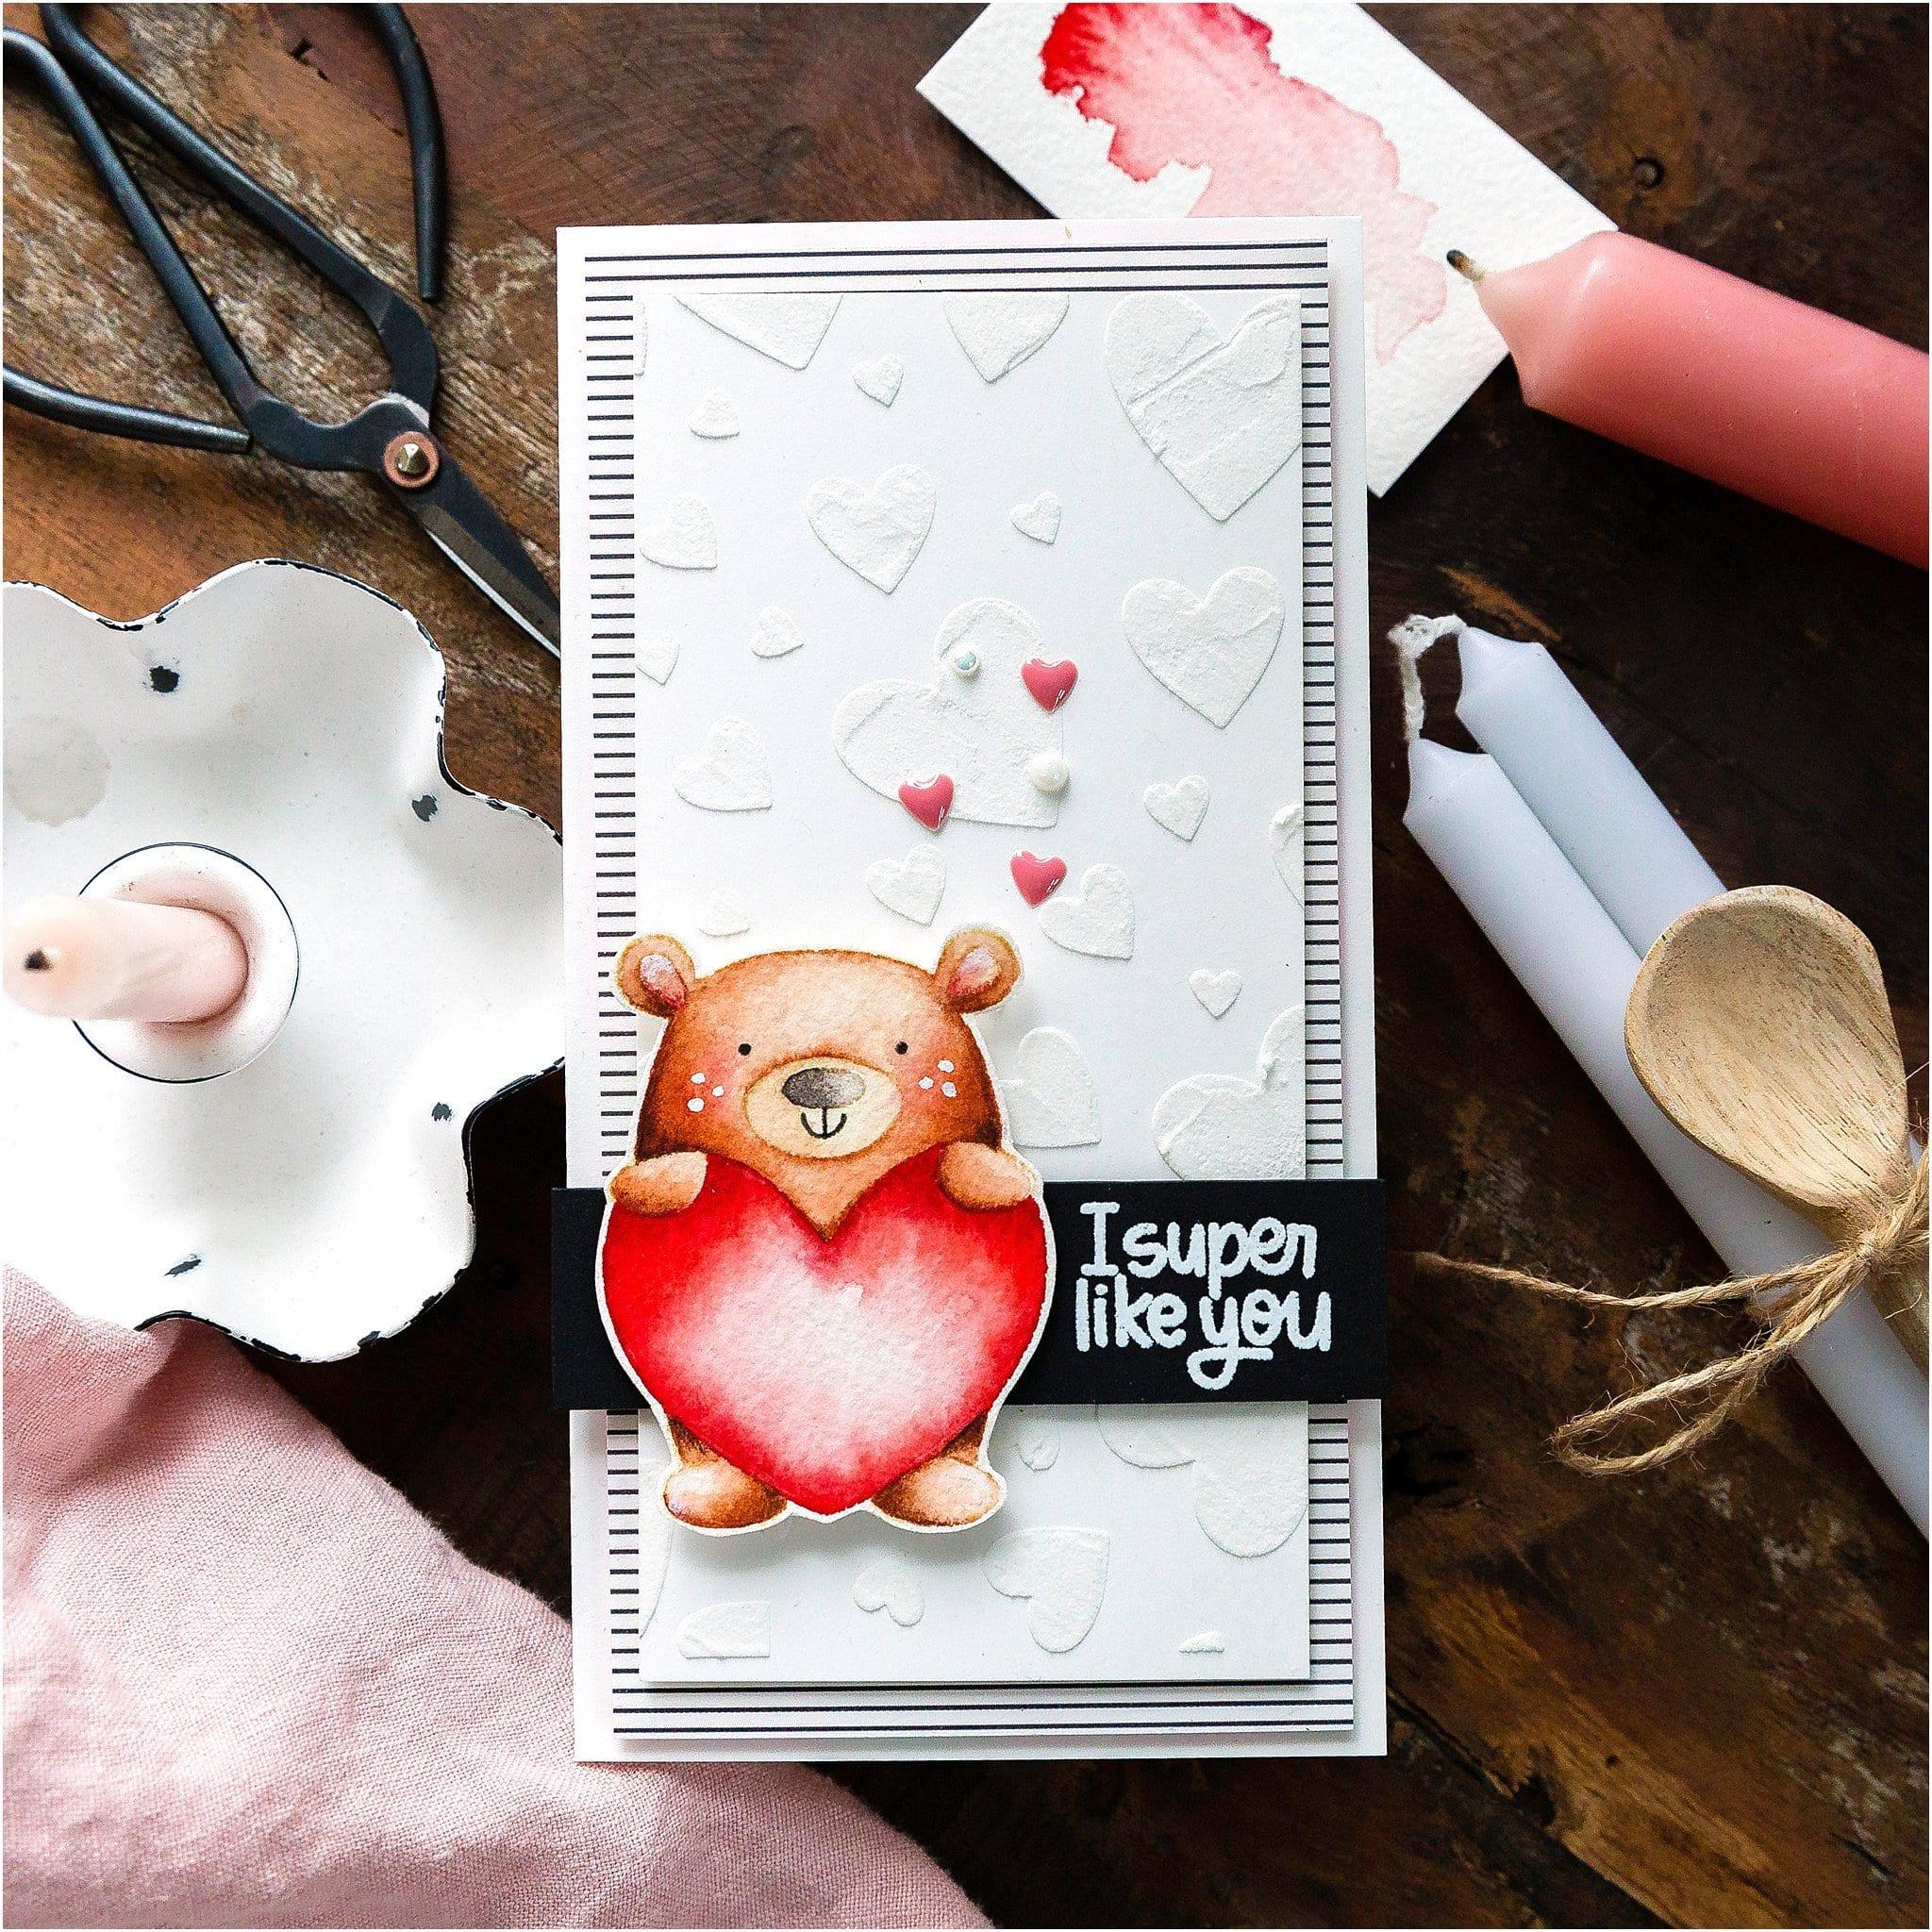 Video tutorial creating a cute mini slimline handmade Valentine's card by Debby Hughes #debbyhughes #limedoodledesign #handmadecards #cardmaking #cardmakingideas #cardmakingtechniques  #cardmakingtutorials #handmadecardideas #simonsaysstamp